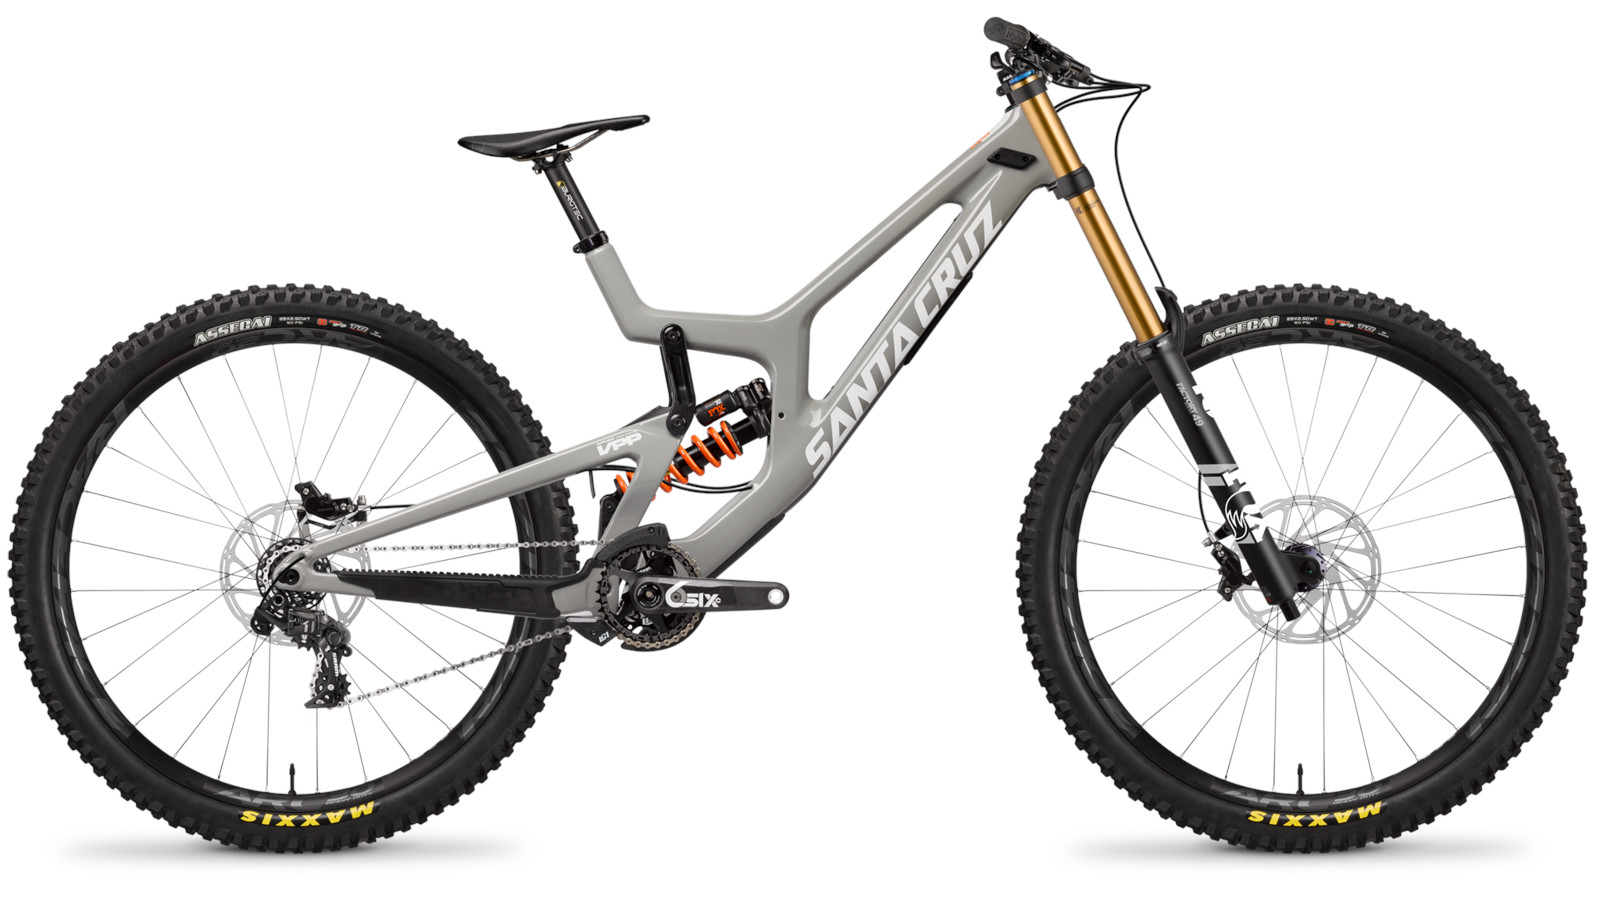 Santa Cruz Releases New V10 DH Bike in 29 and 27.5 Along ...